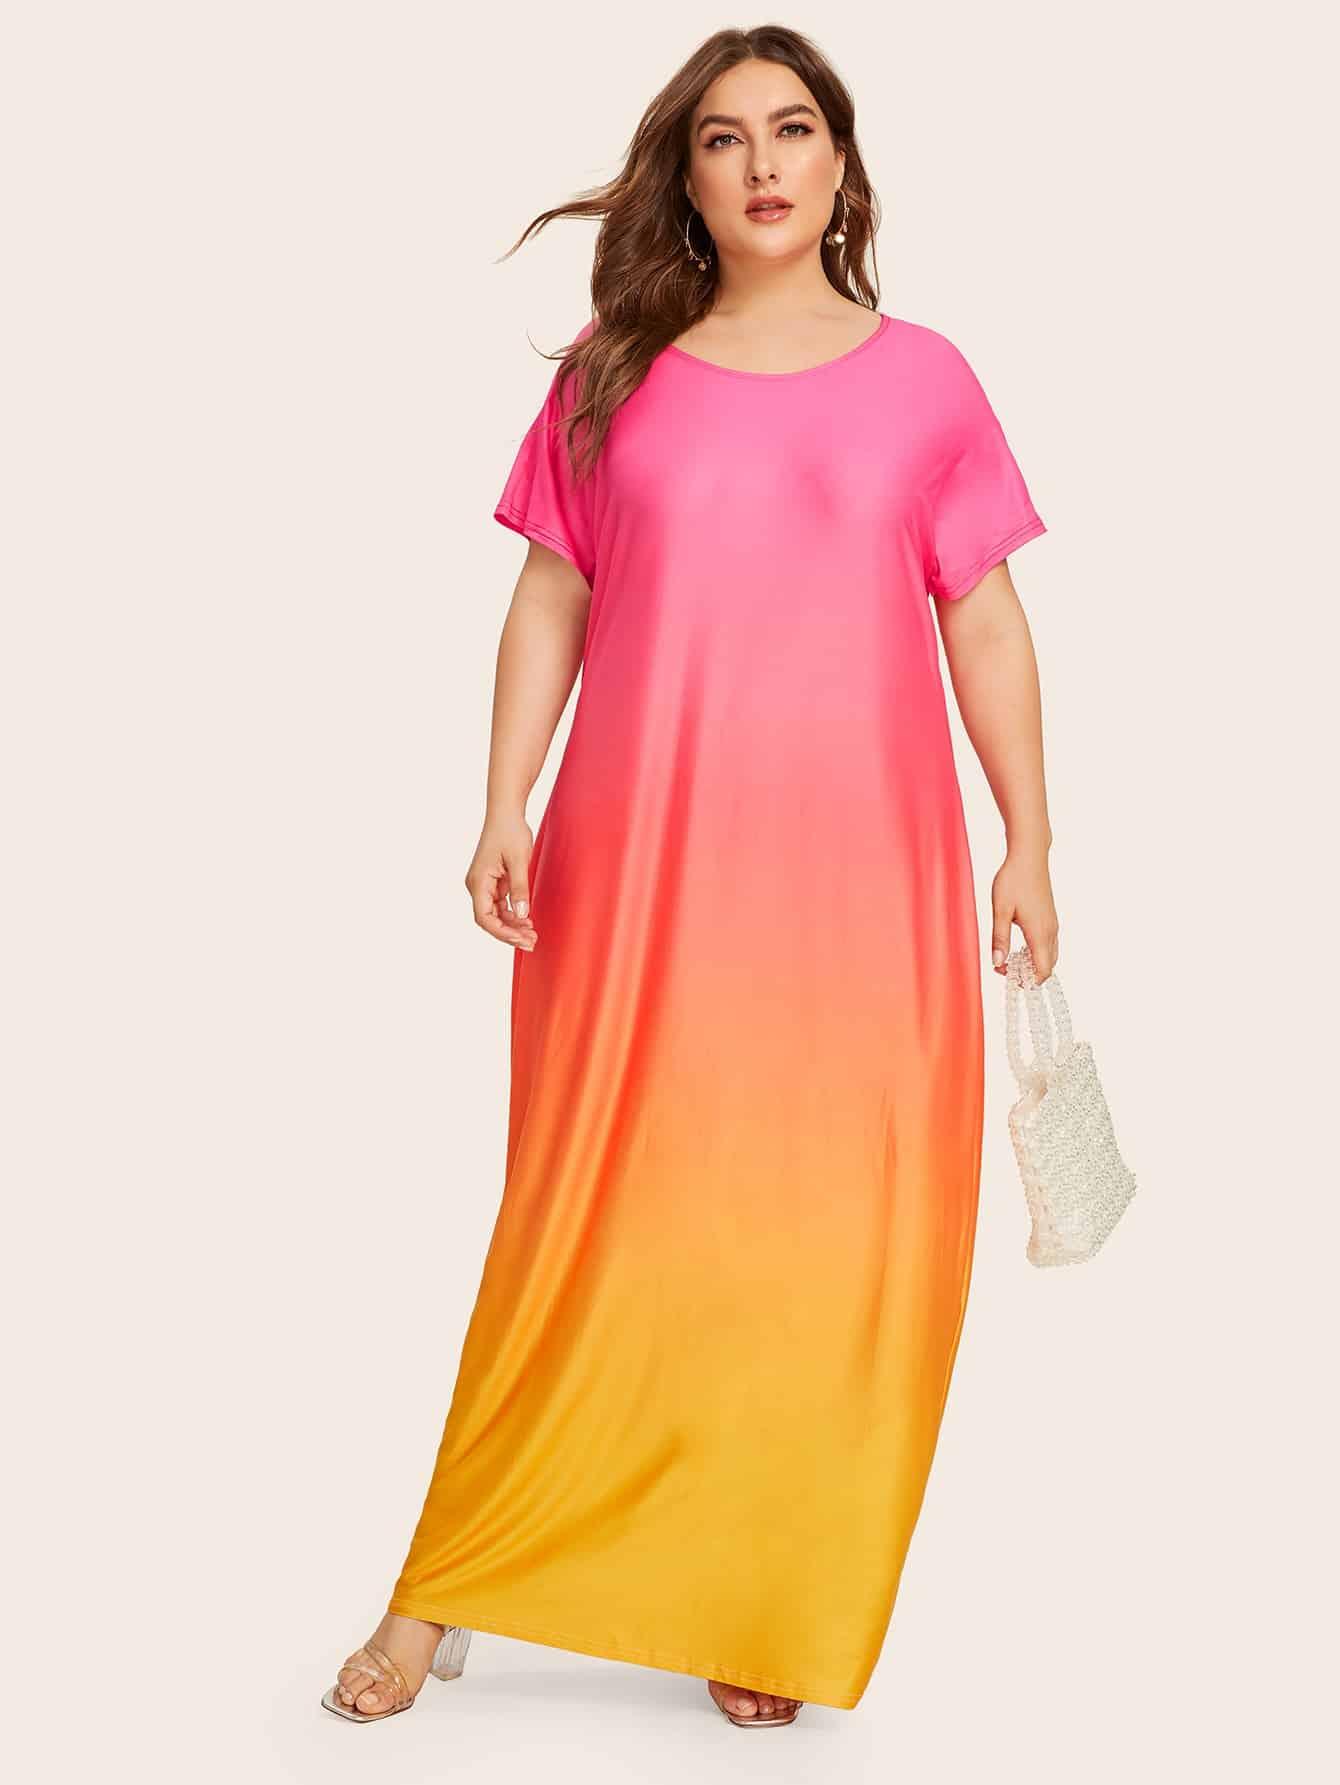 Фото - Длинное платье-футболка размера плюс от SheIn цвет цвет хамелеон